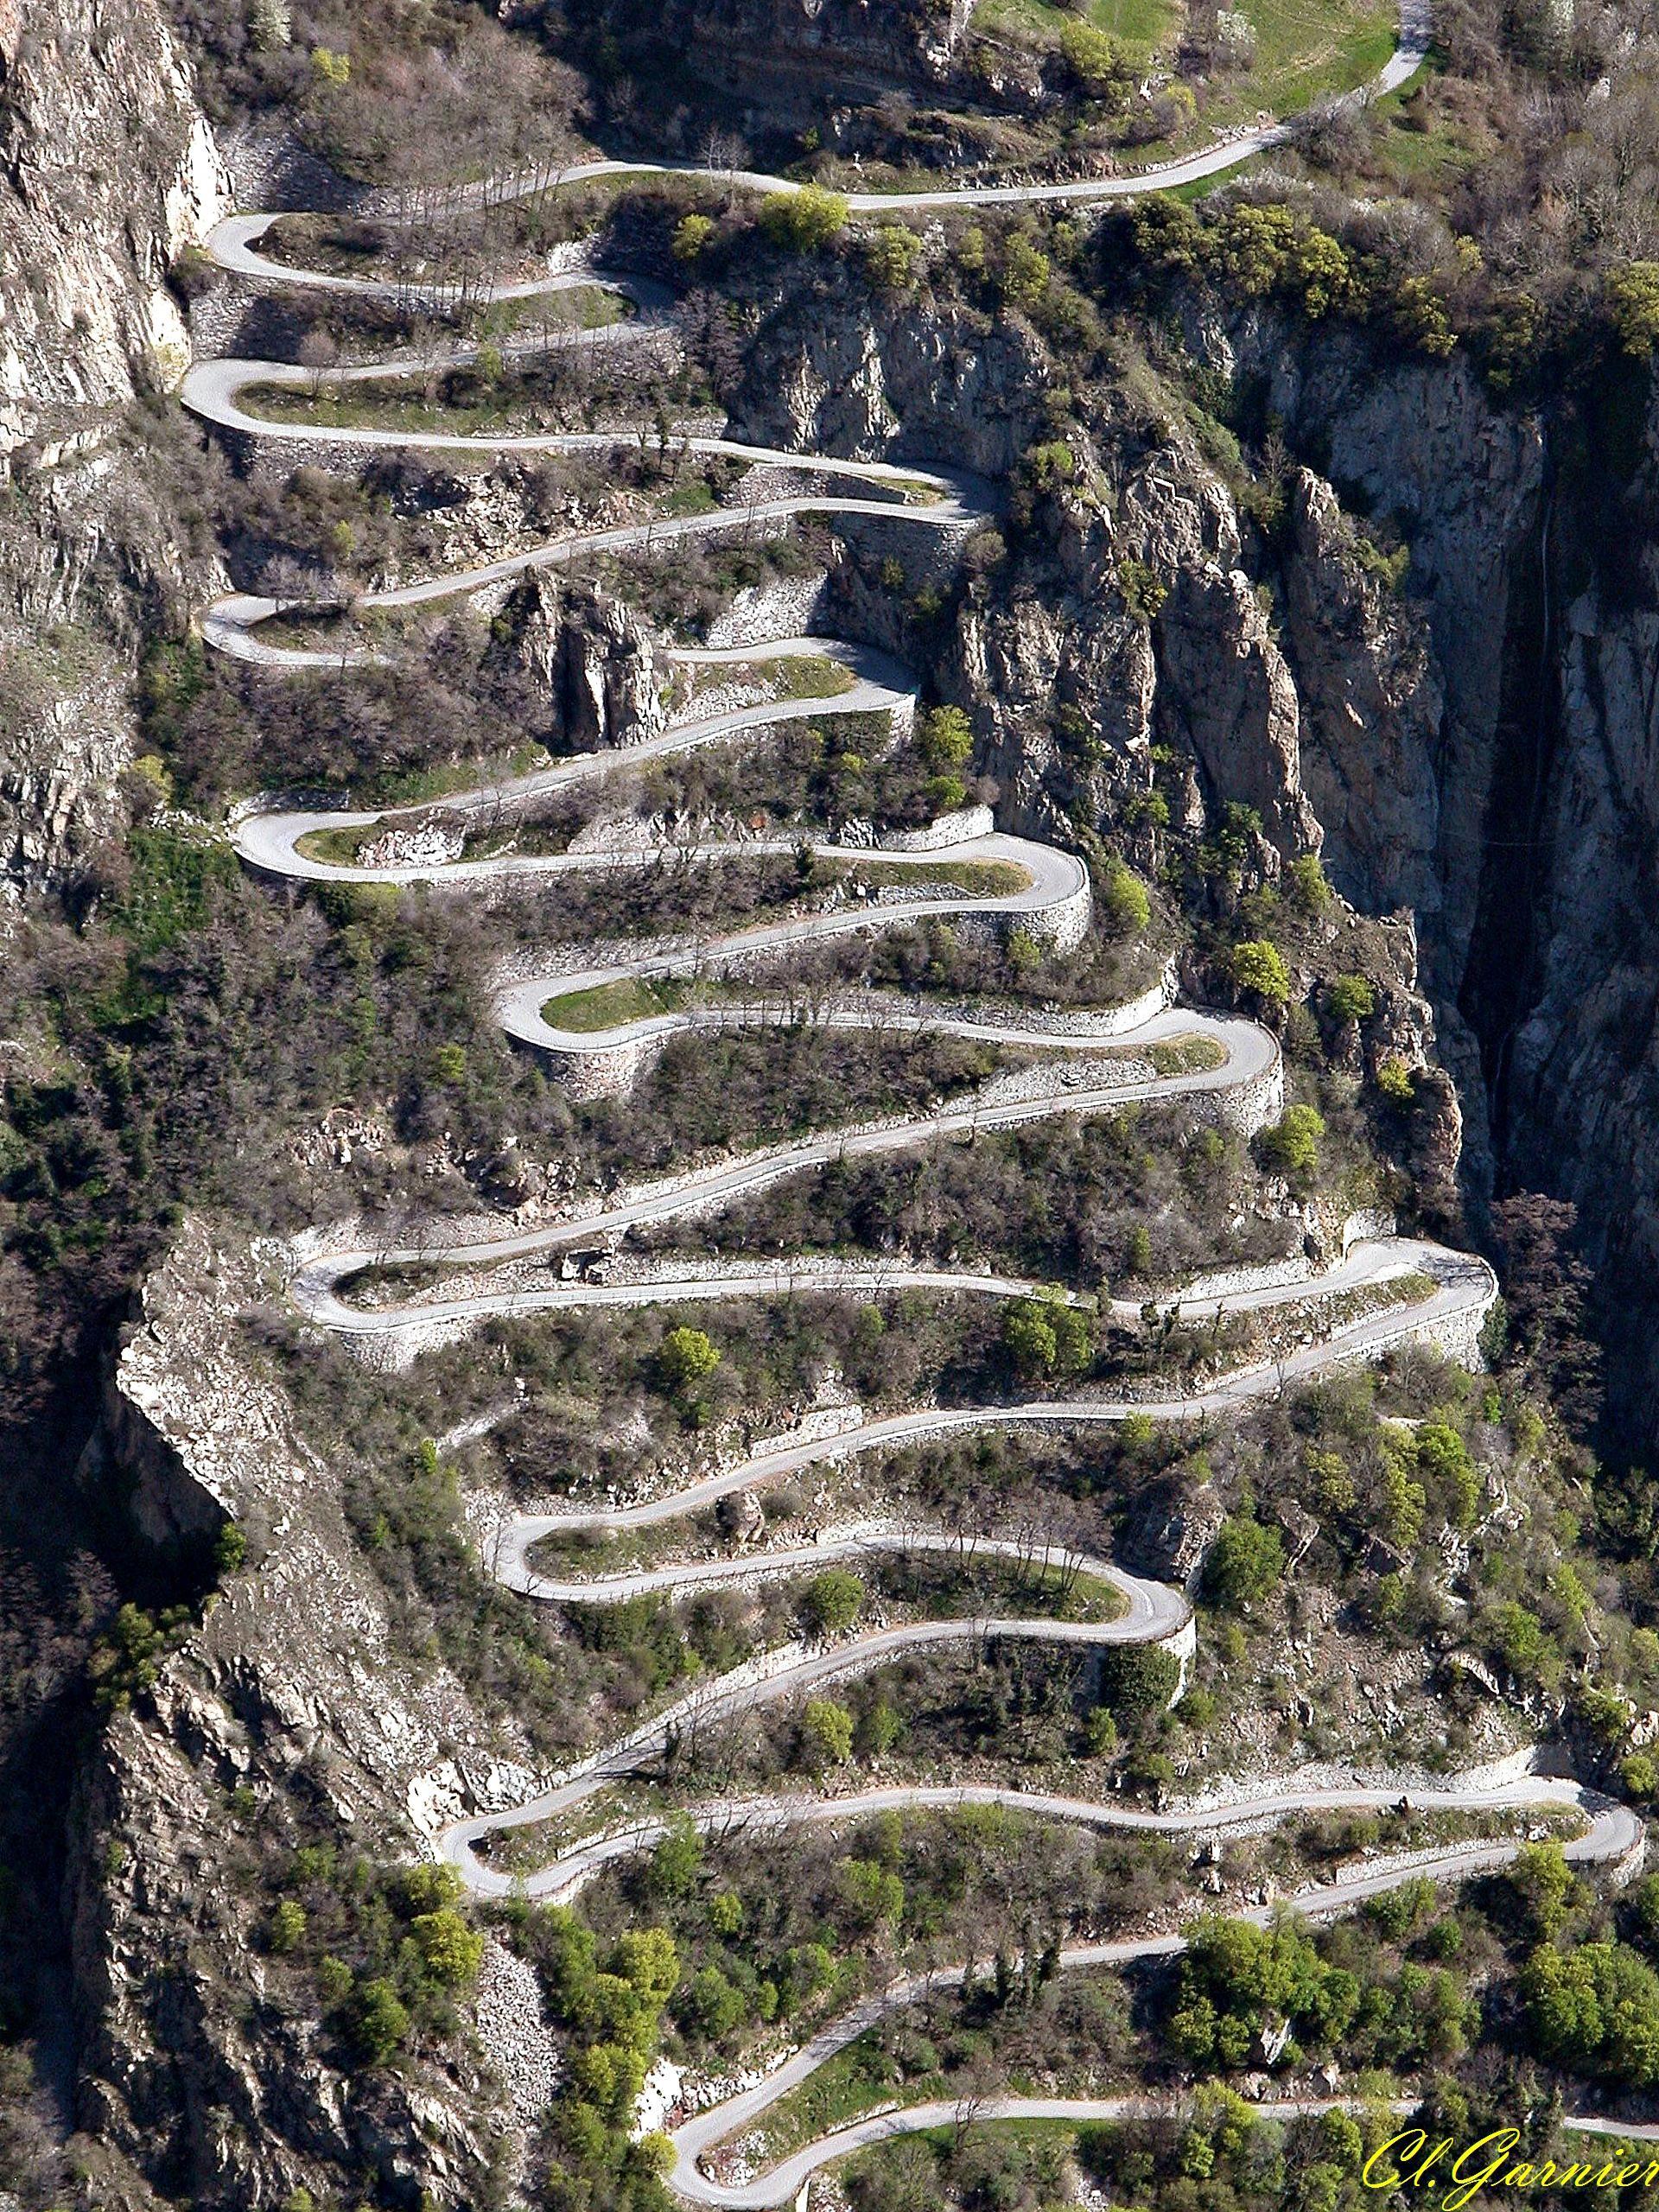 Ultimate Cycling Road #fixieimages #fixielife #fixieporn #singlespeed #fixie #quella #fixedwheel #myquella #fixedgear